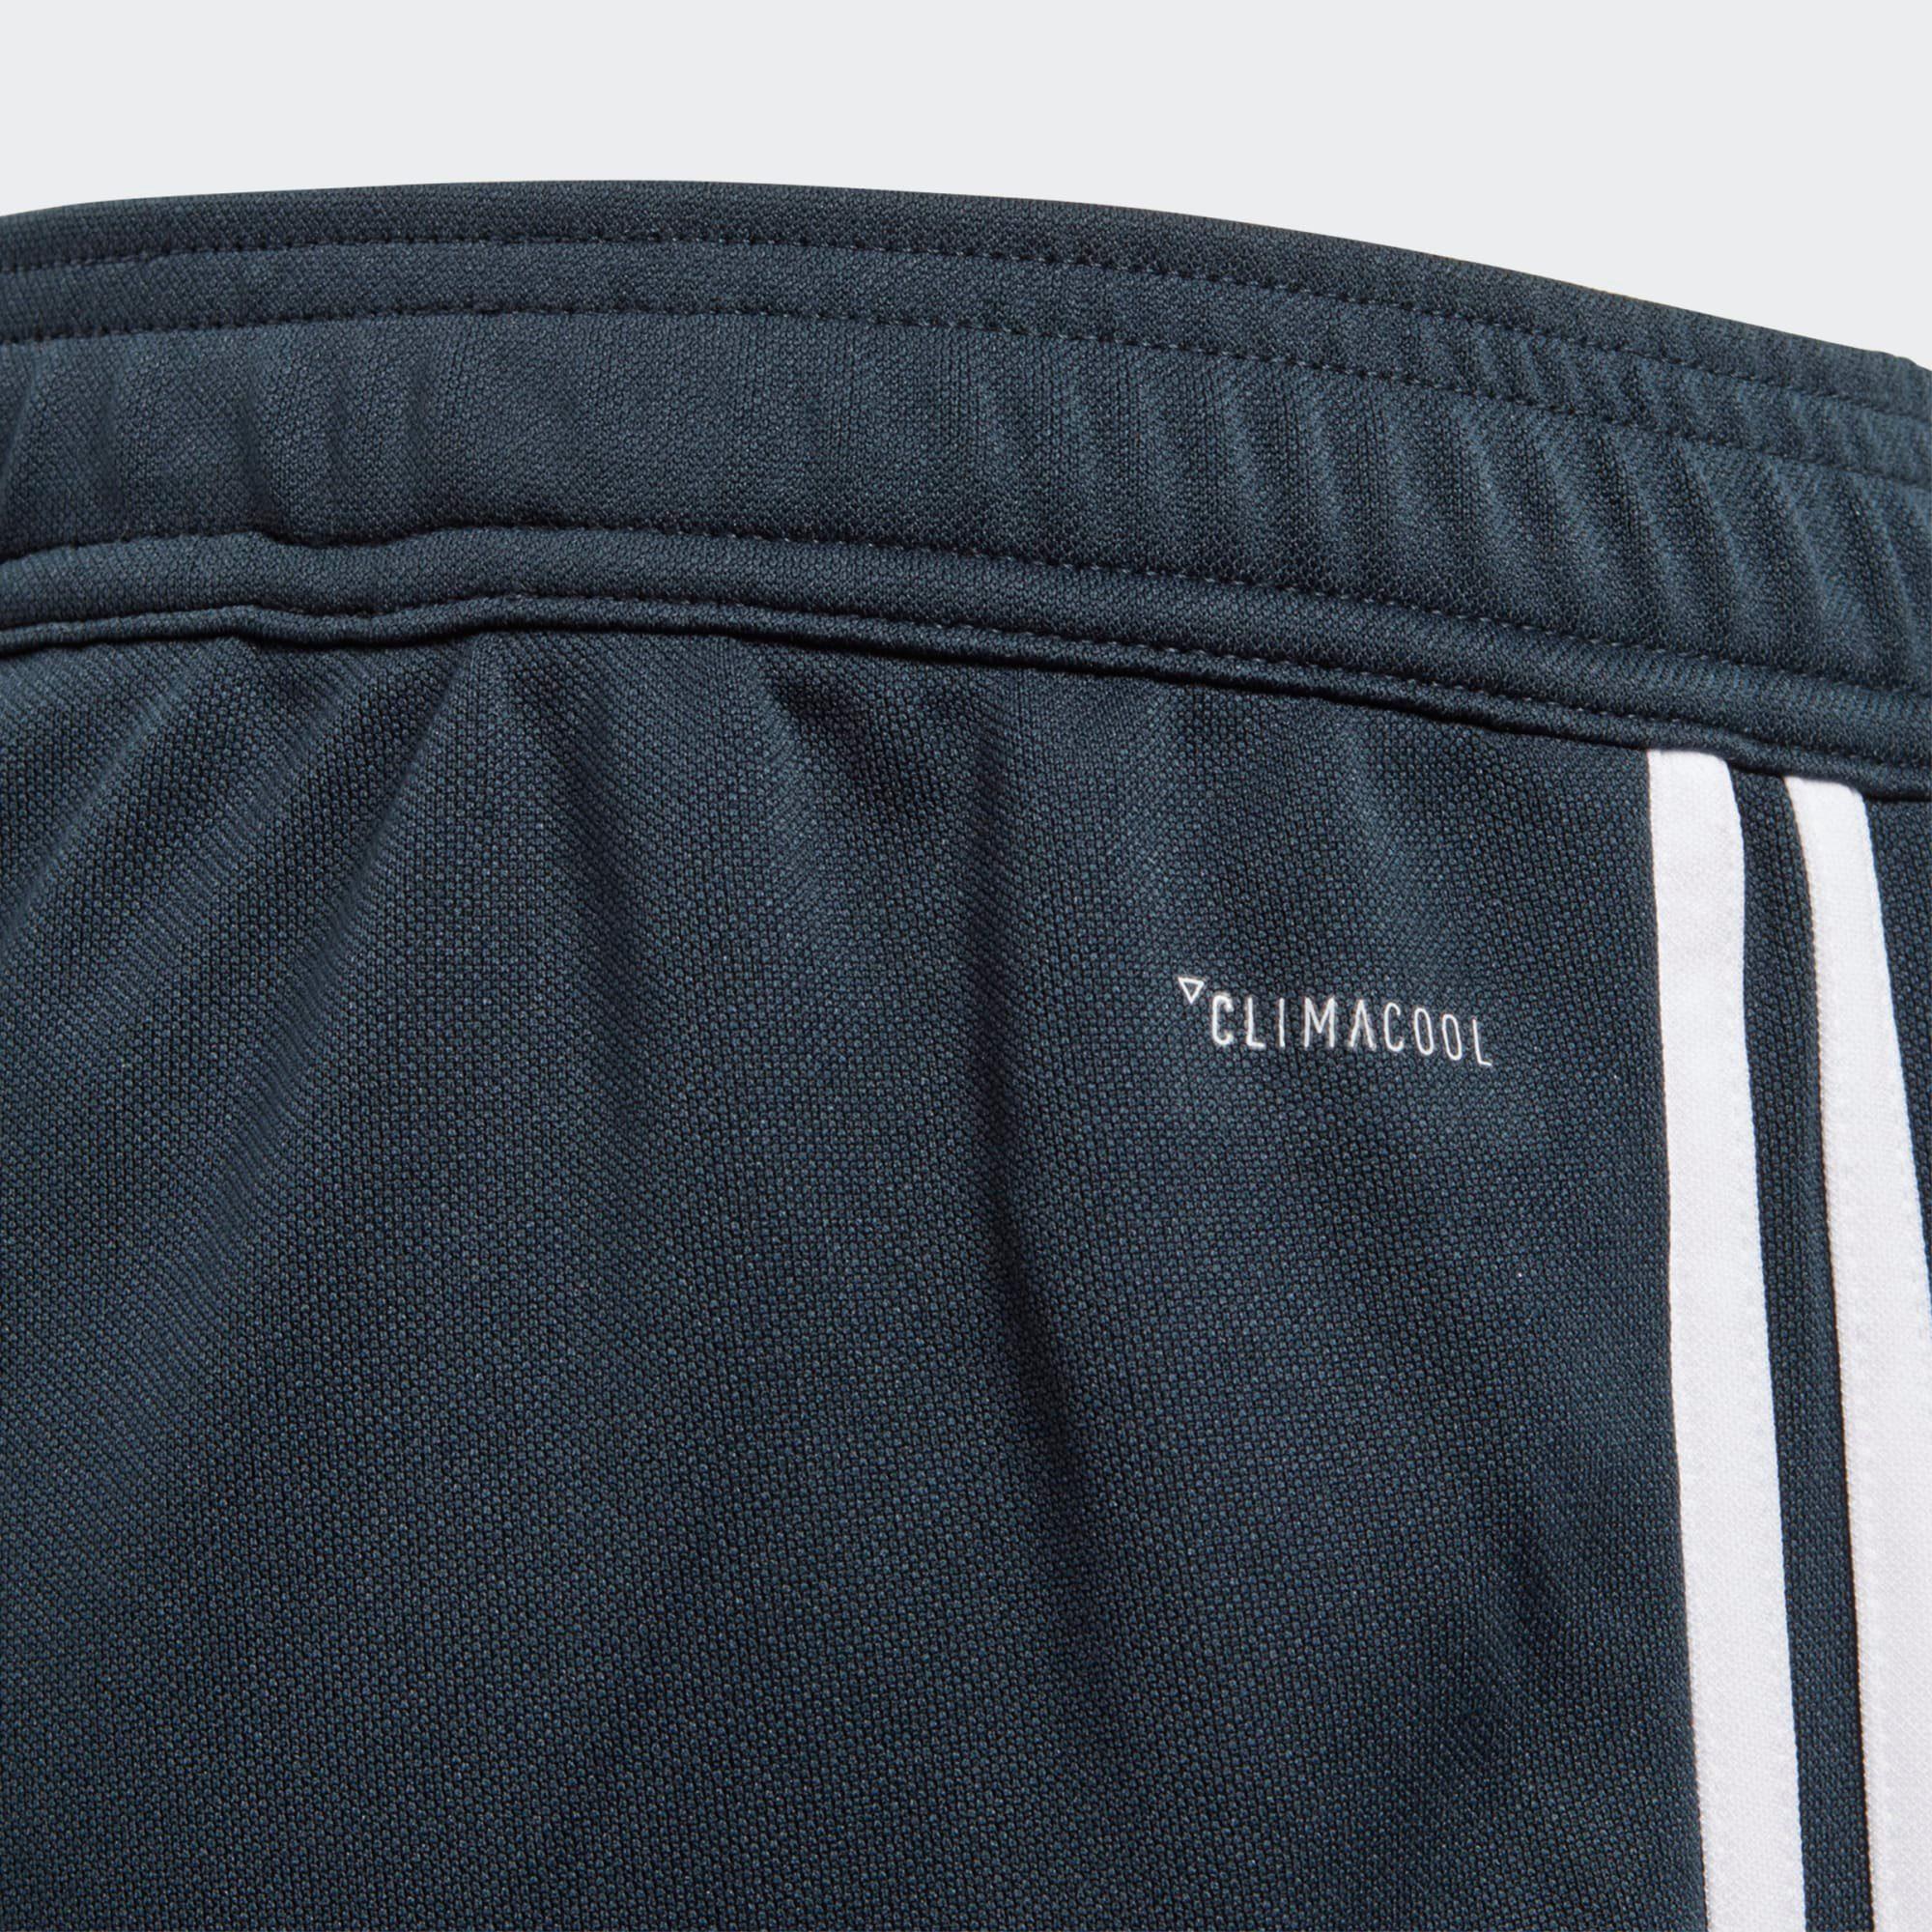 jogginghose adidas polyester clima cool